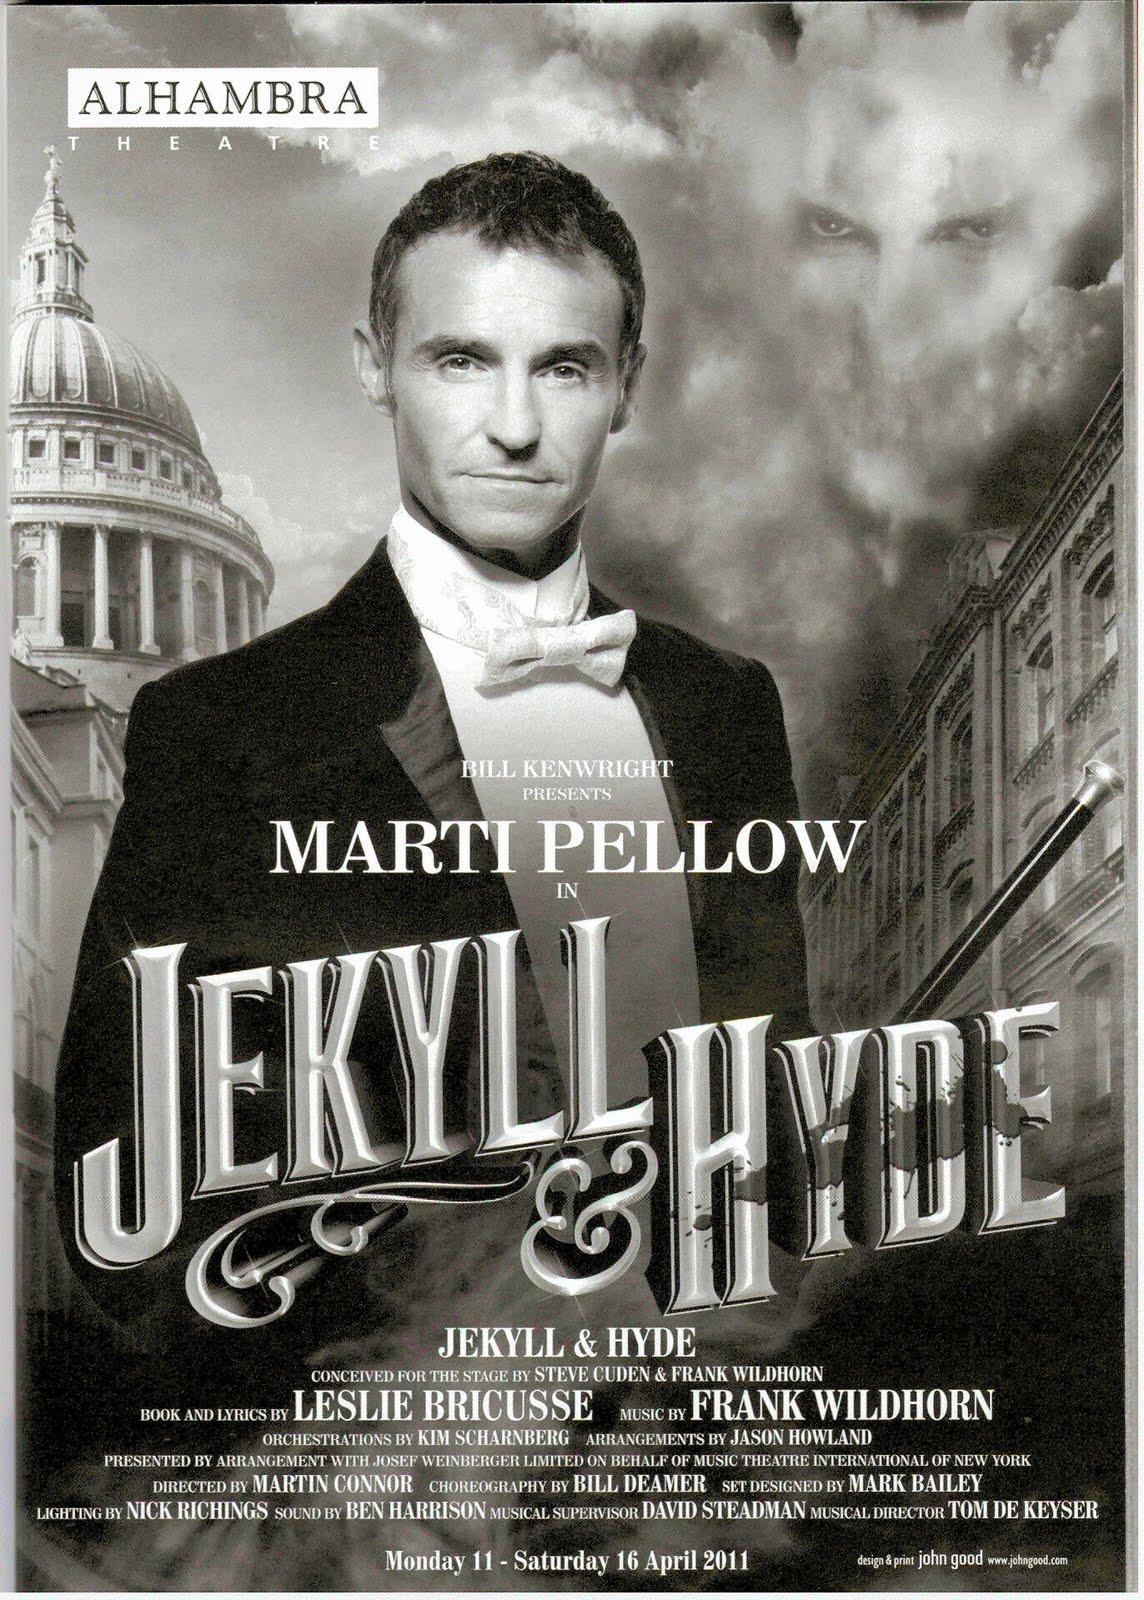 http://2.bp.blogspot.com/-CLWKmio2N-s/Tasaf2GcpLI/AAAAAAAAB9A/56ABwWZKz-o/s1600/Jekyll+and+Hyde.jpg